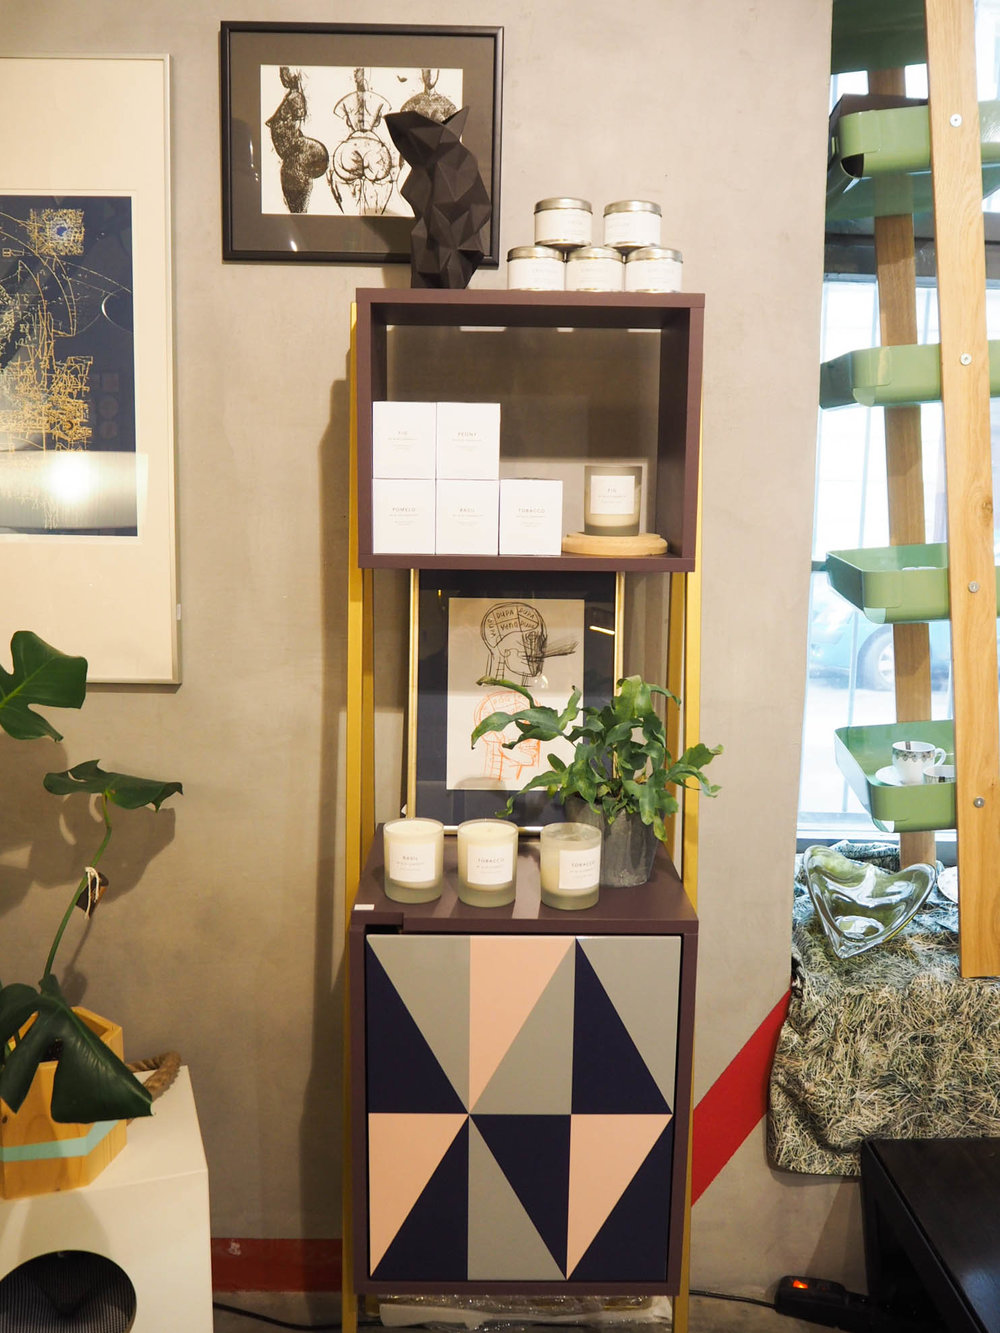 Marka Concept store in Krakow, Poland.